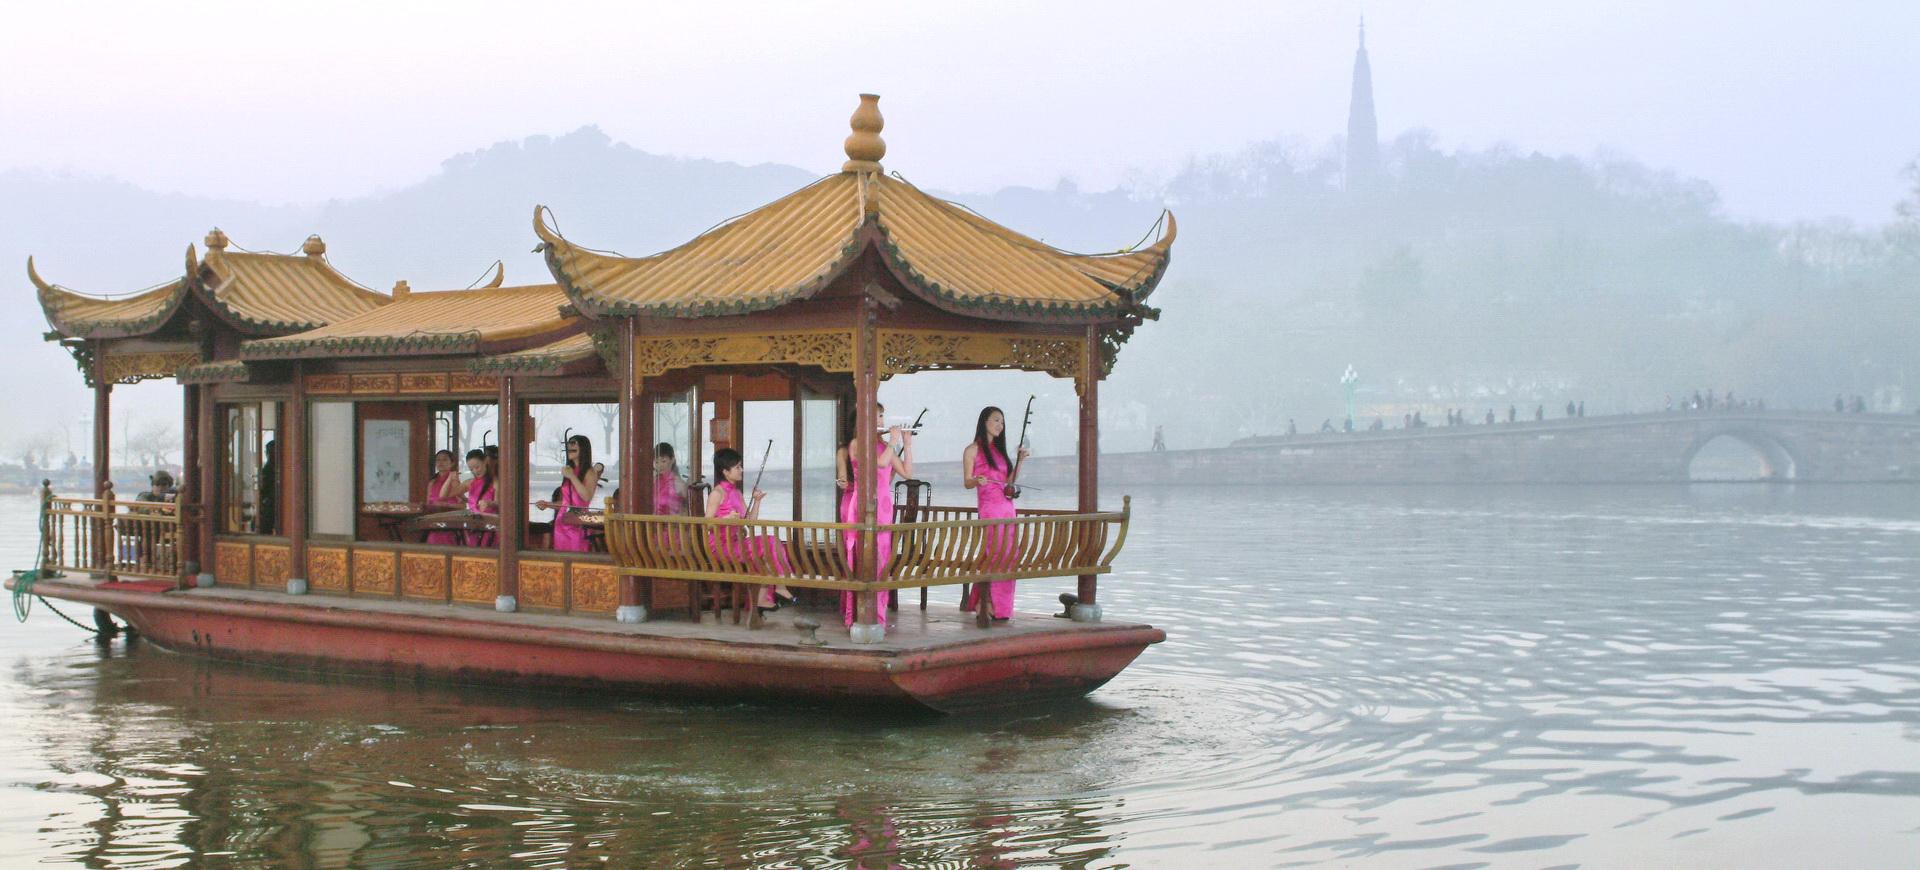 Voyage en Chine sans visa